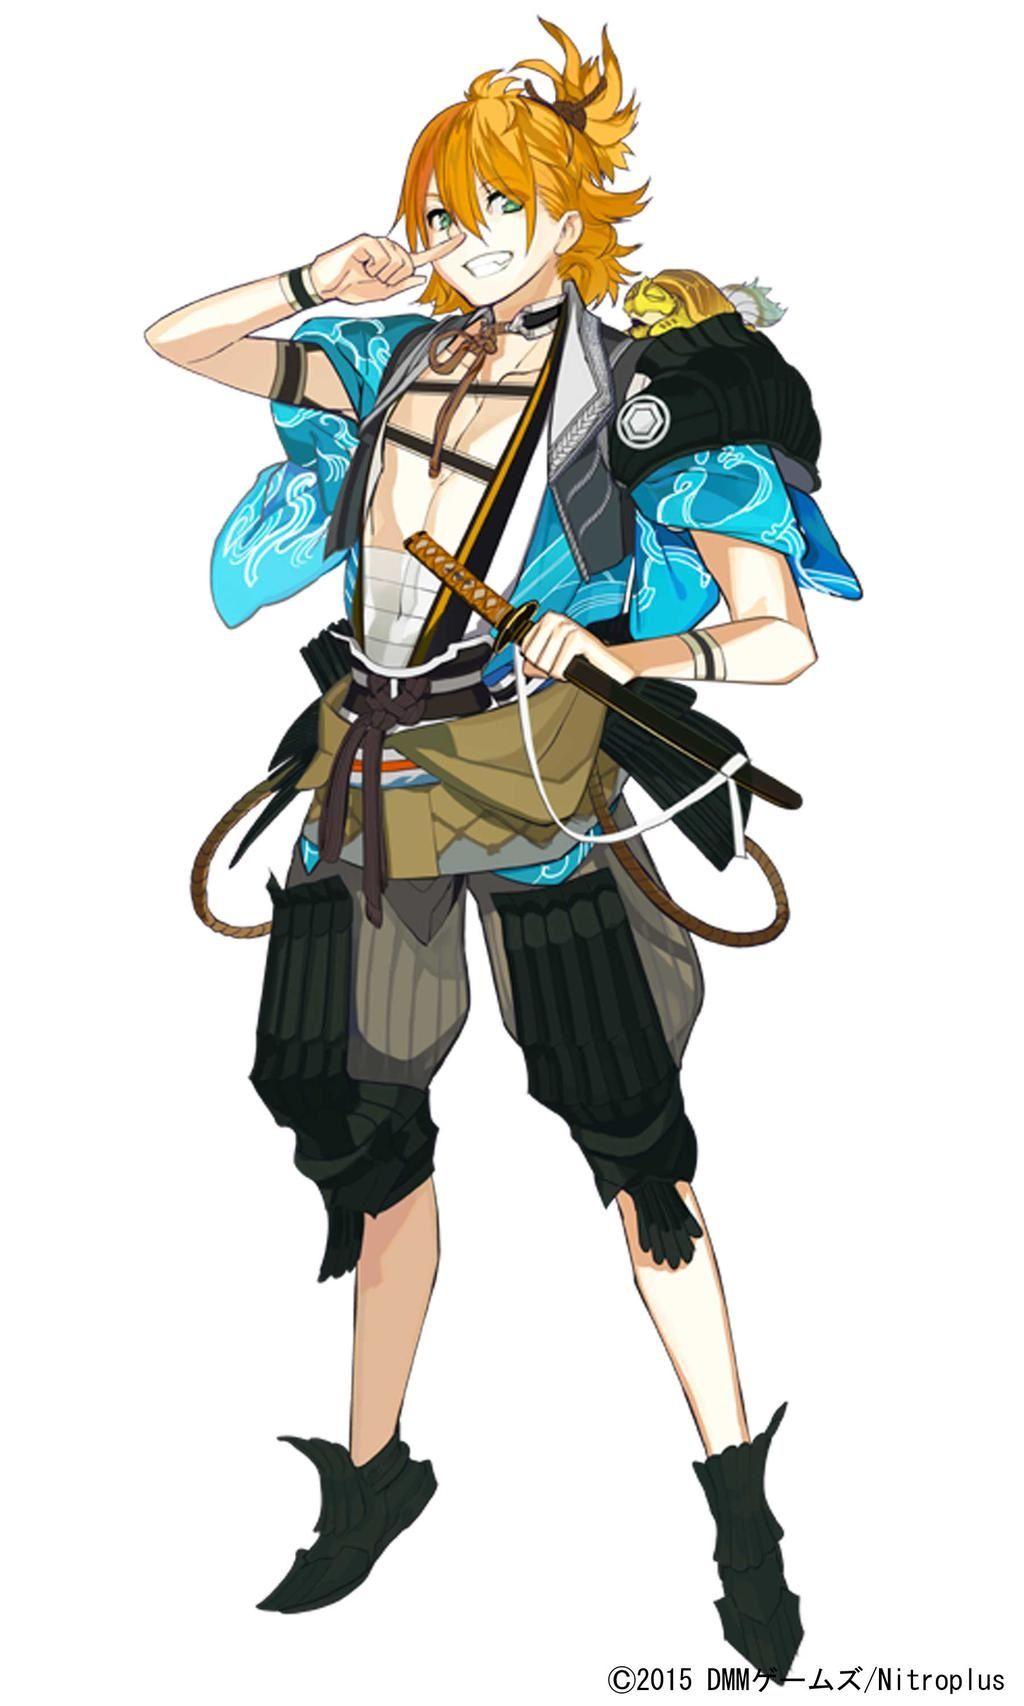 Urashima Kotetsu Touken ranbu characters, Anime